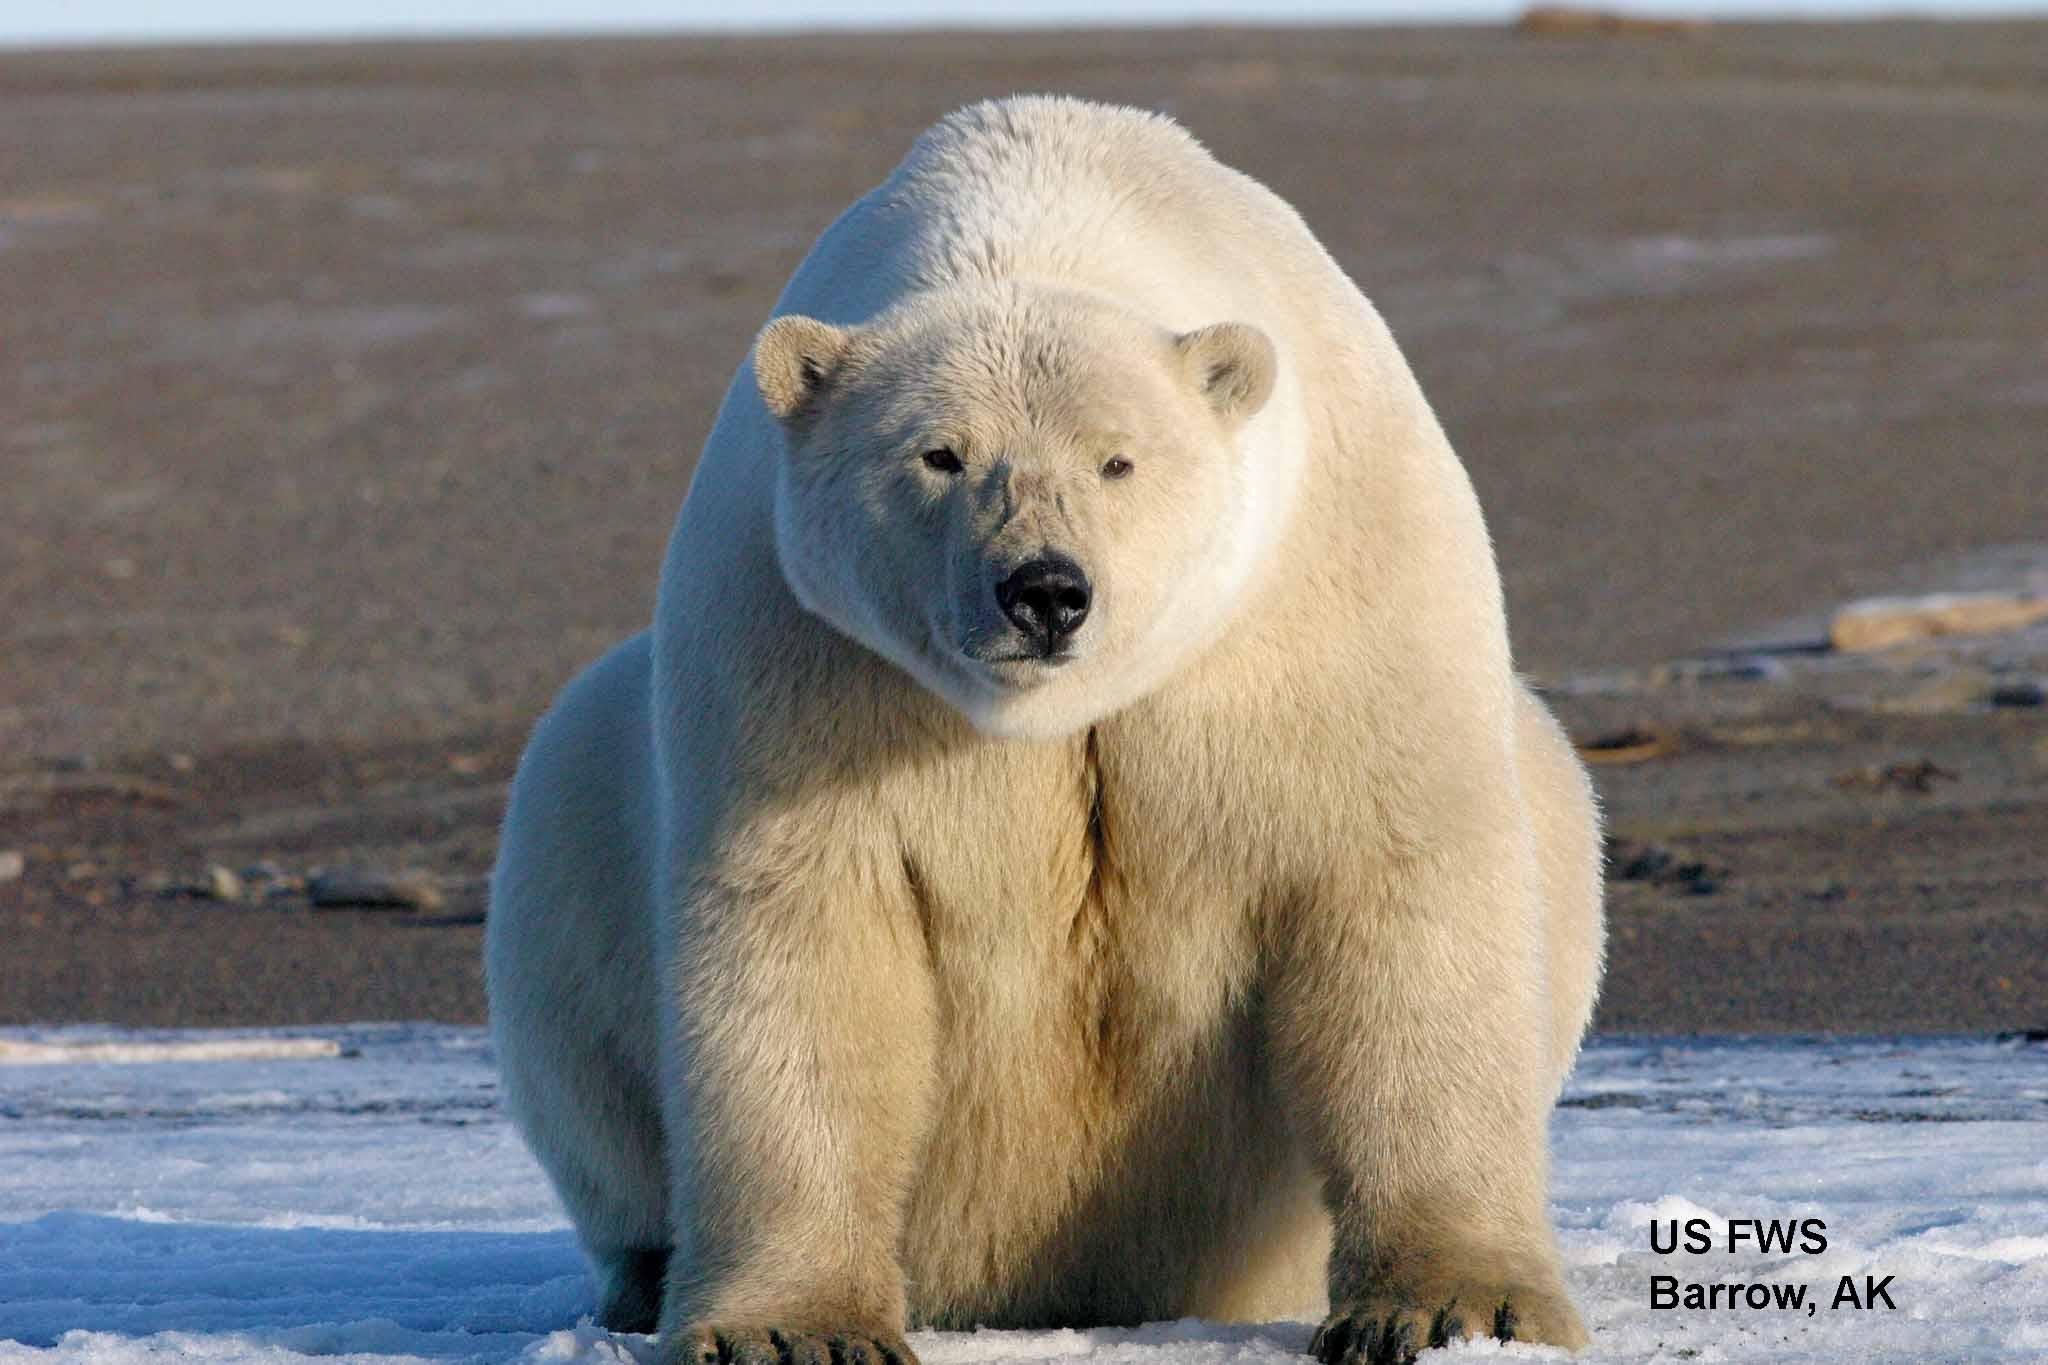 Drawn polar  bear cannibal Barrow_labeled cannibalism polarbearscience AK USFWS